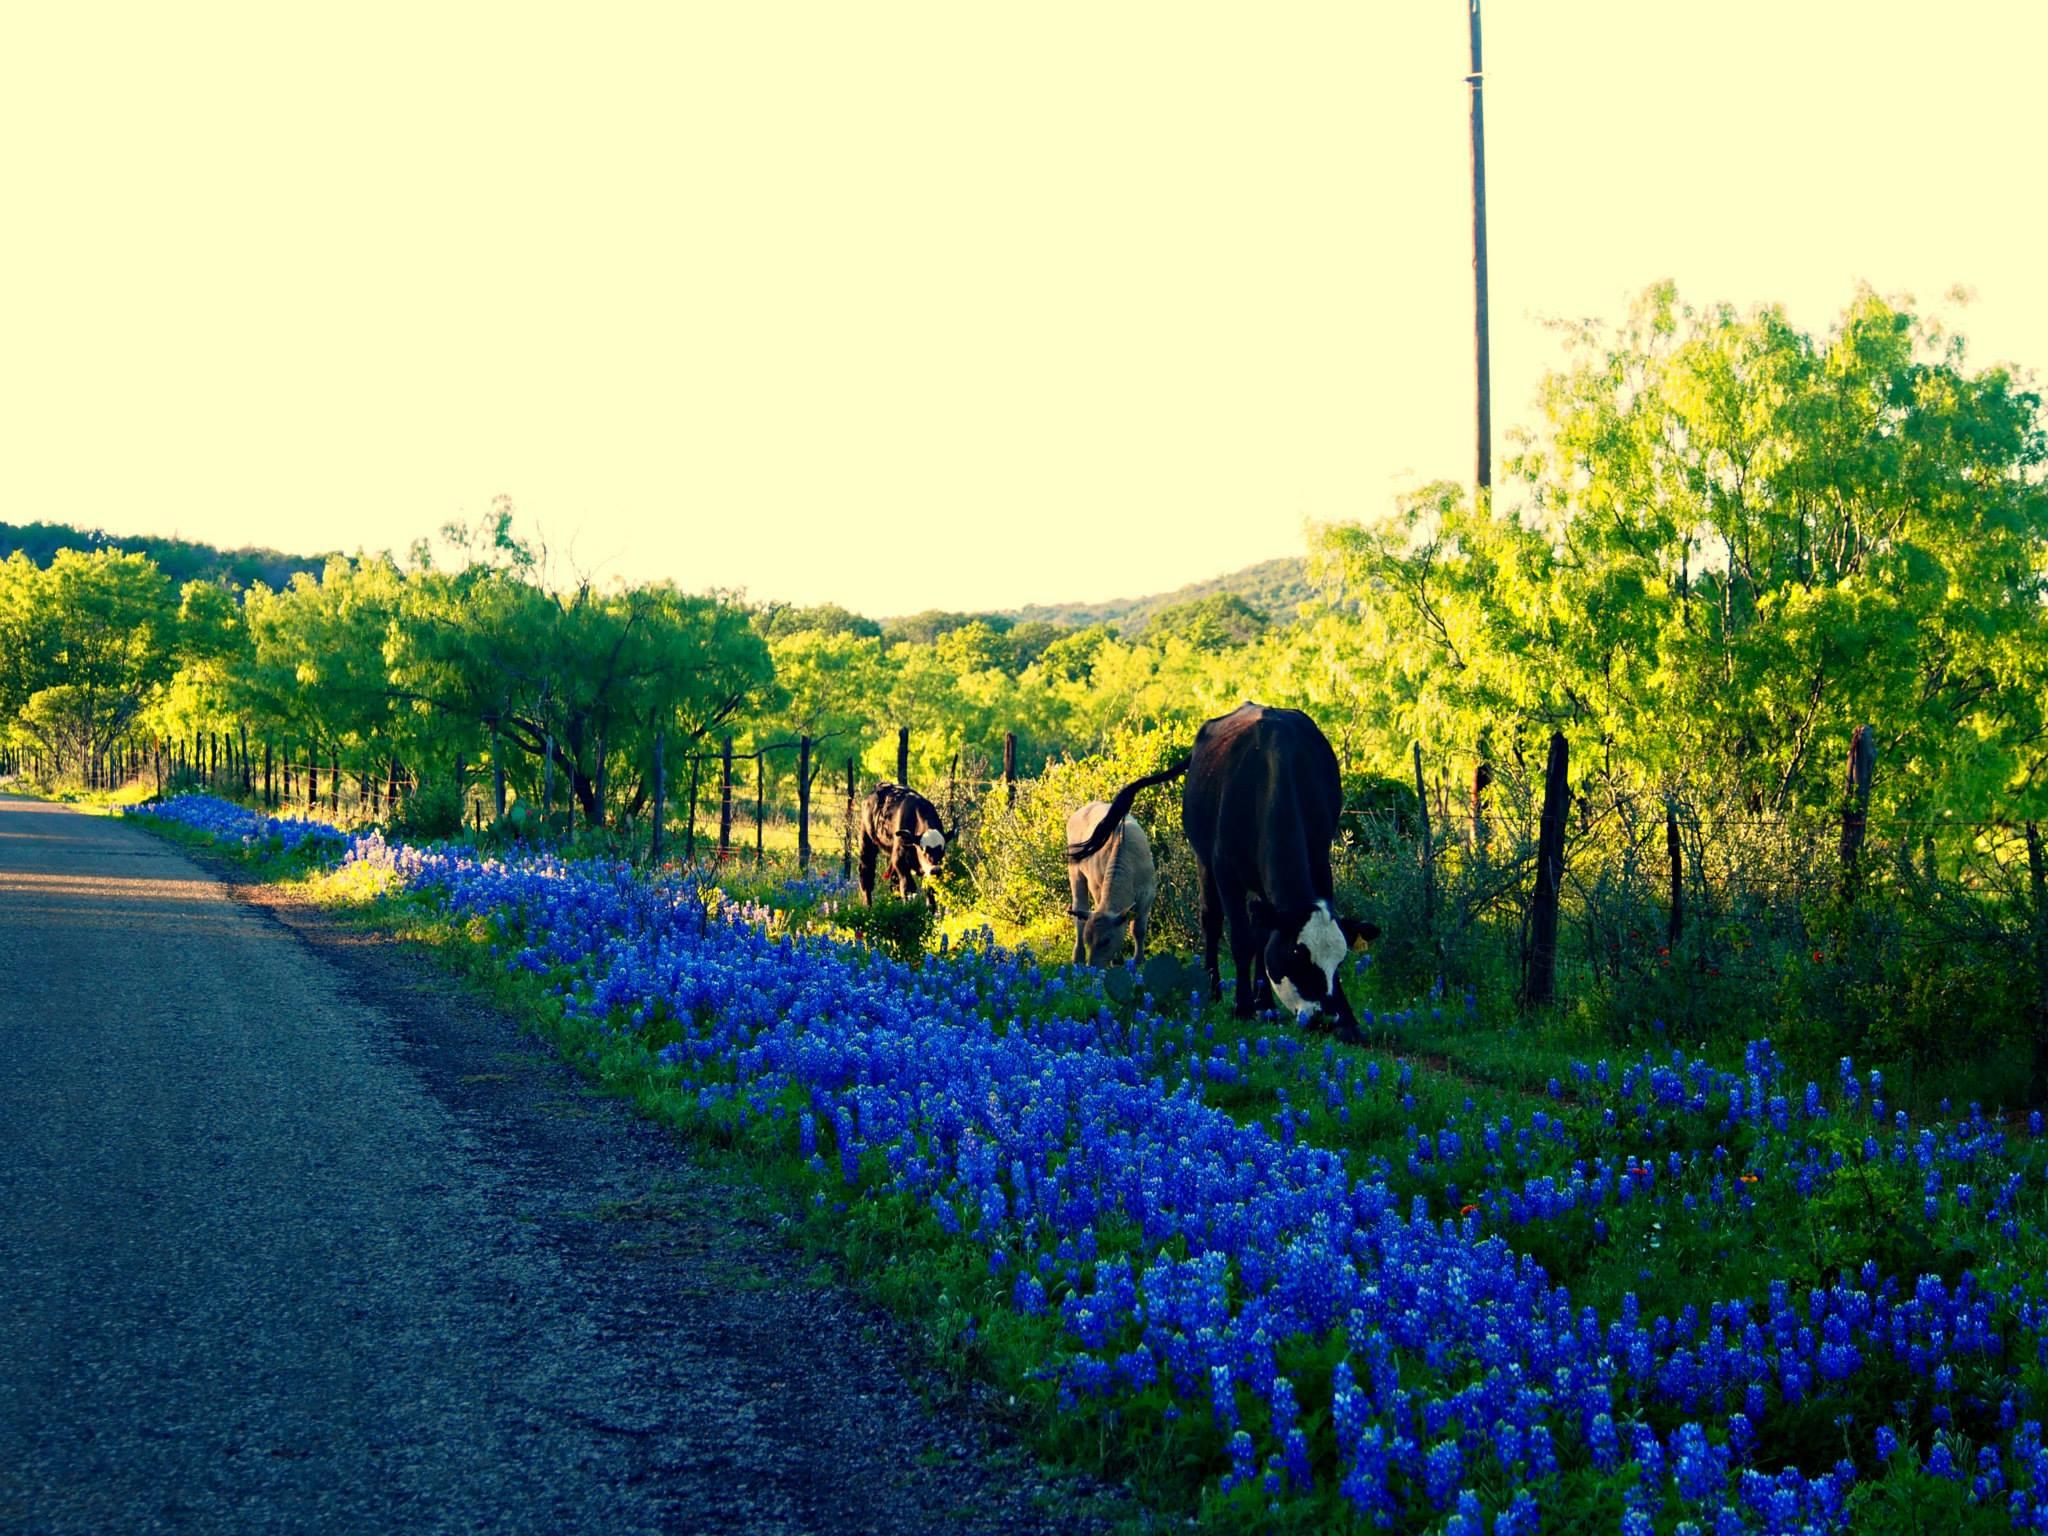 bluebonnets-cows-texas